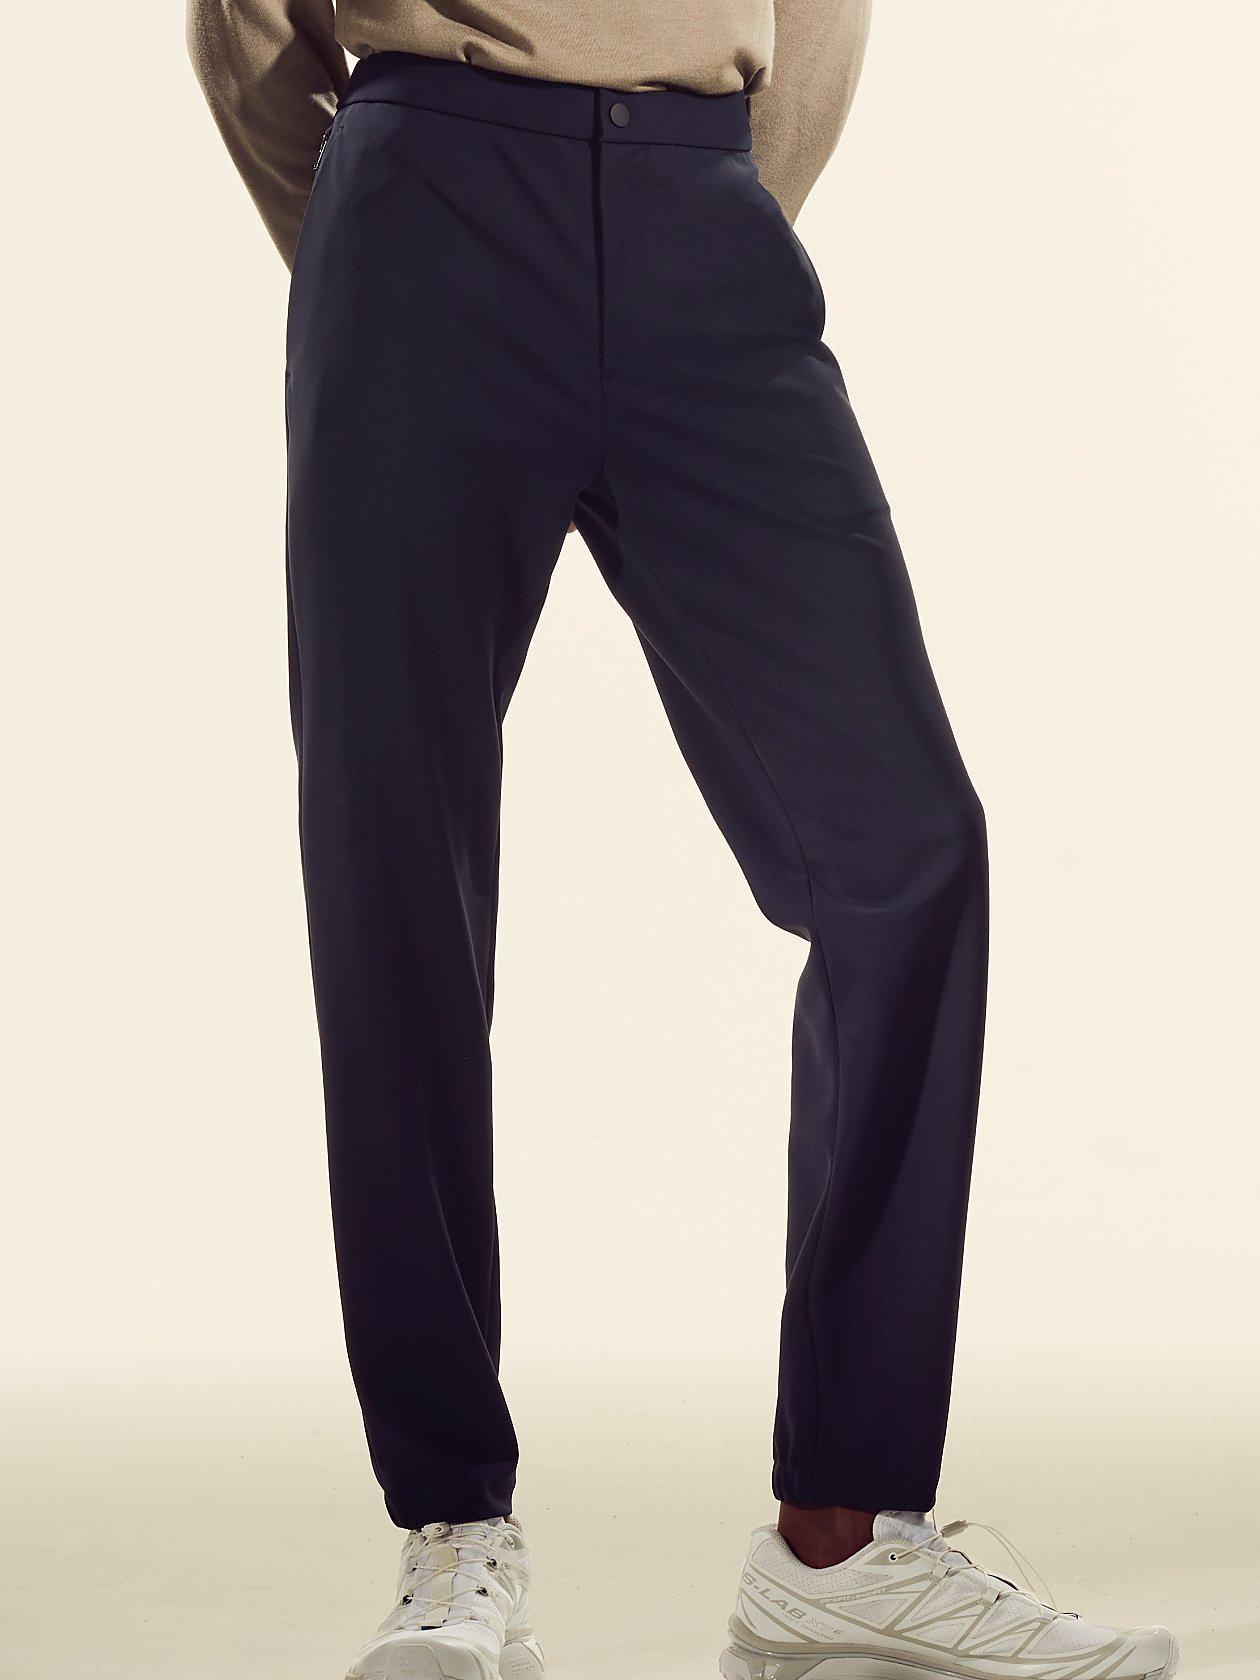 TERRANCE PANT